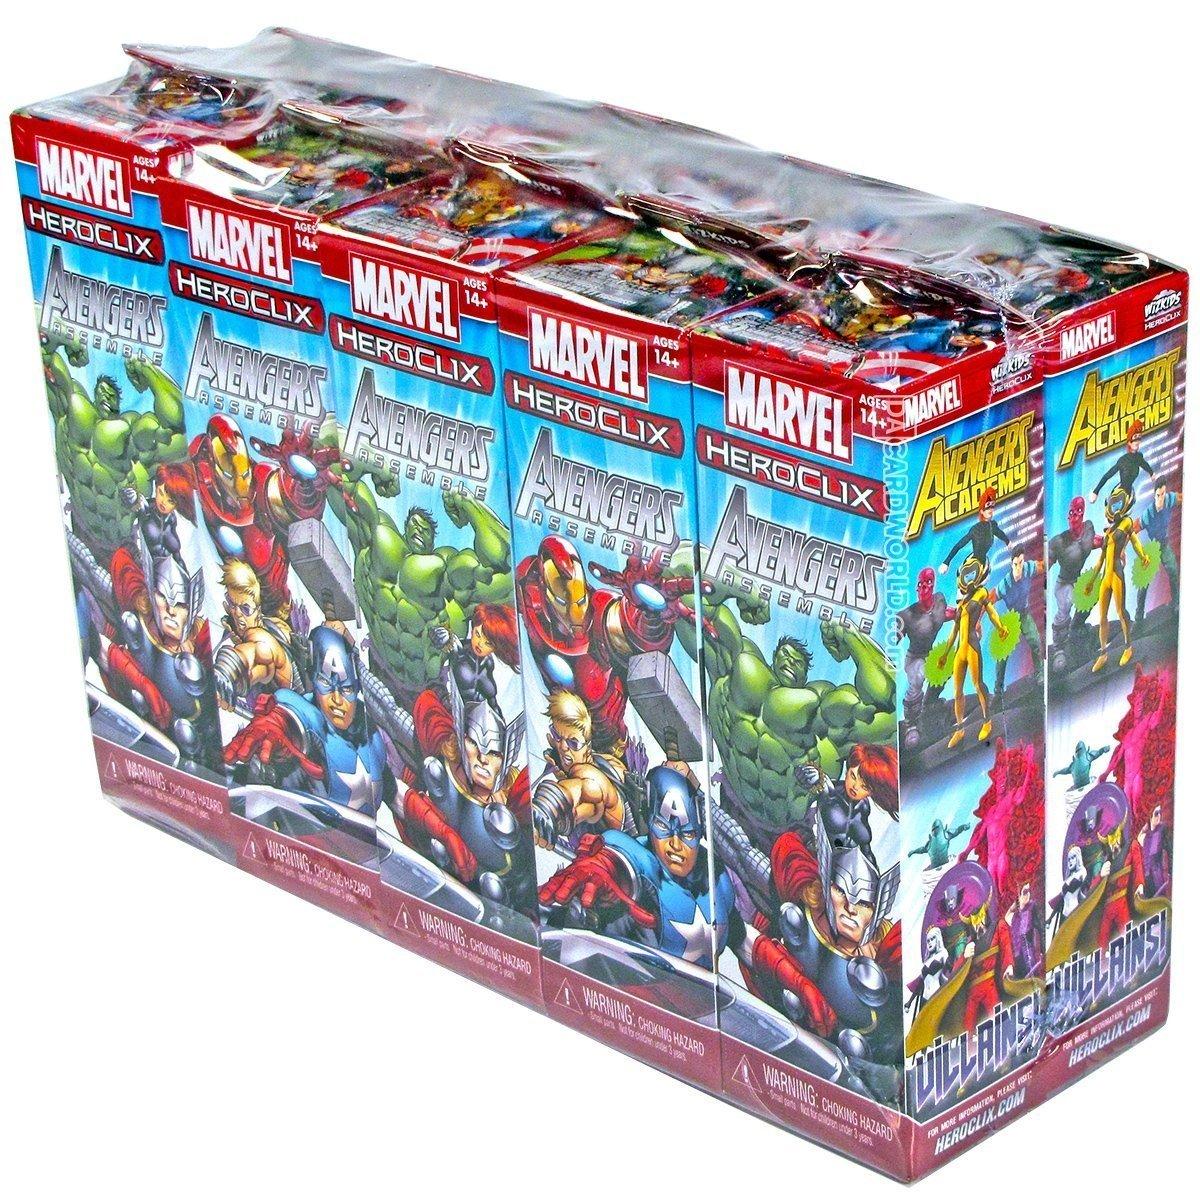 Marvel HeroClix: Avengers Assemble Booster Brick